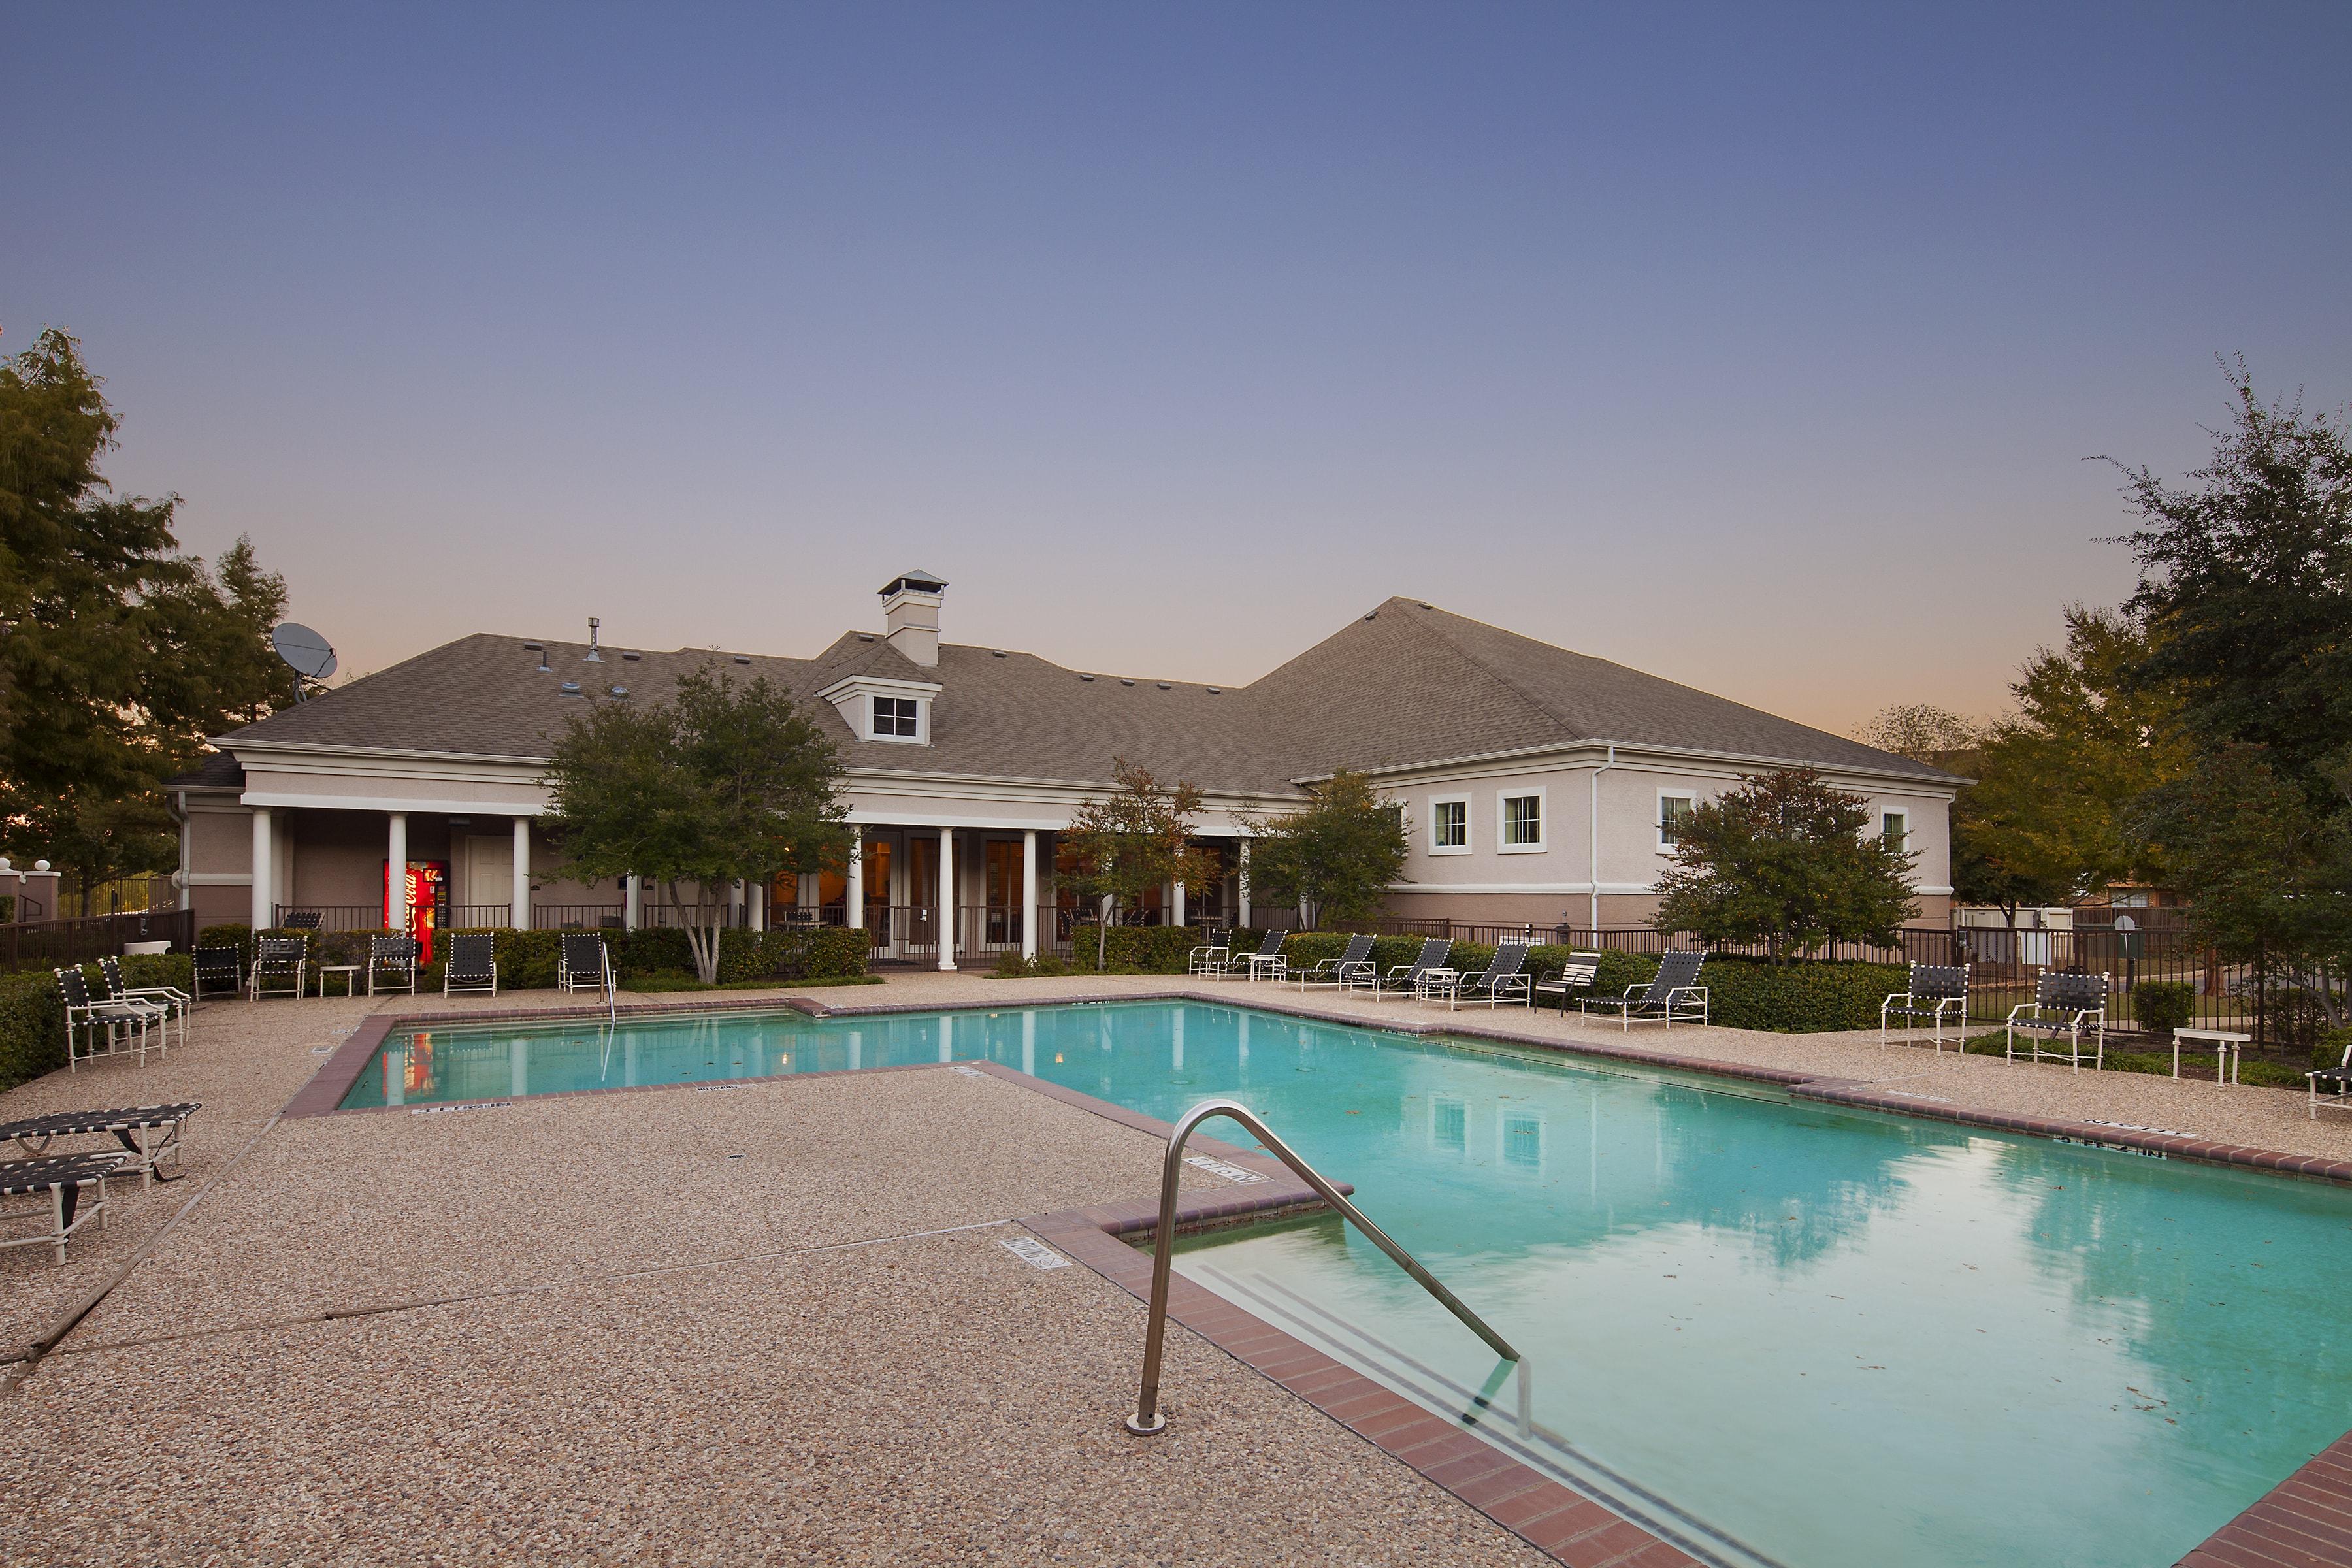 The Reserve at Las Brisas Apartments image 4